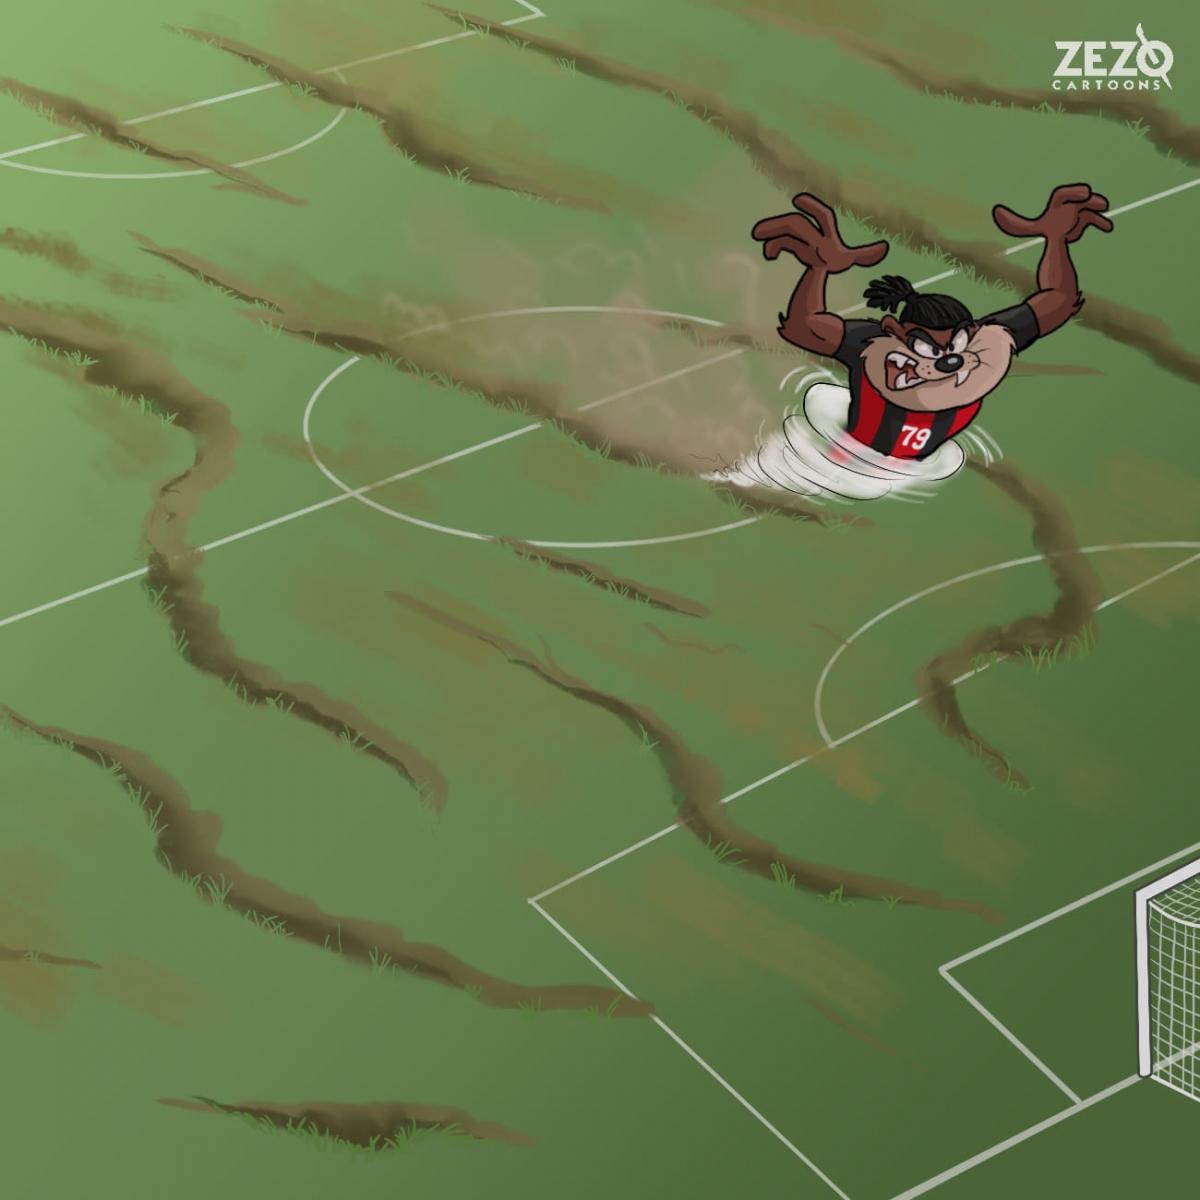 """Máy chạy"" Franck Kessie. (Ảnh: ZEZO Cartoons)"